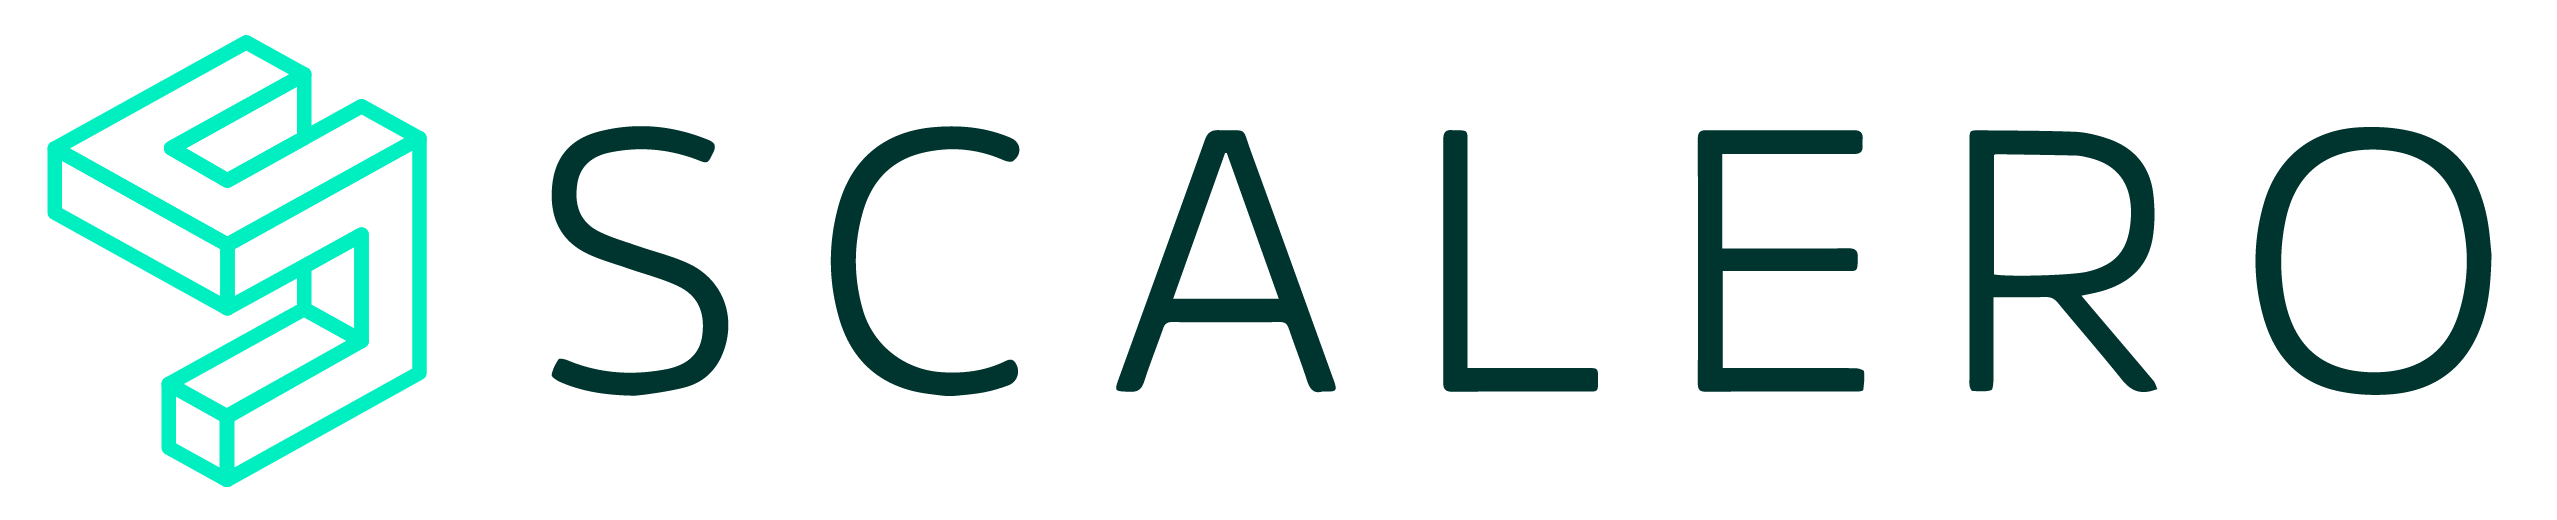 Scalero company logo